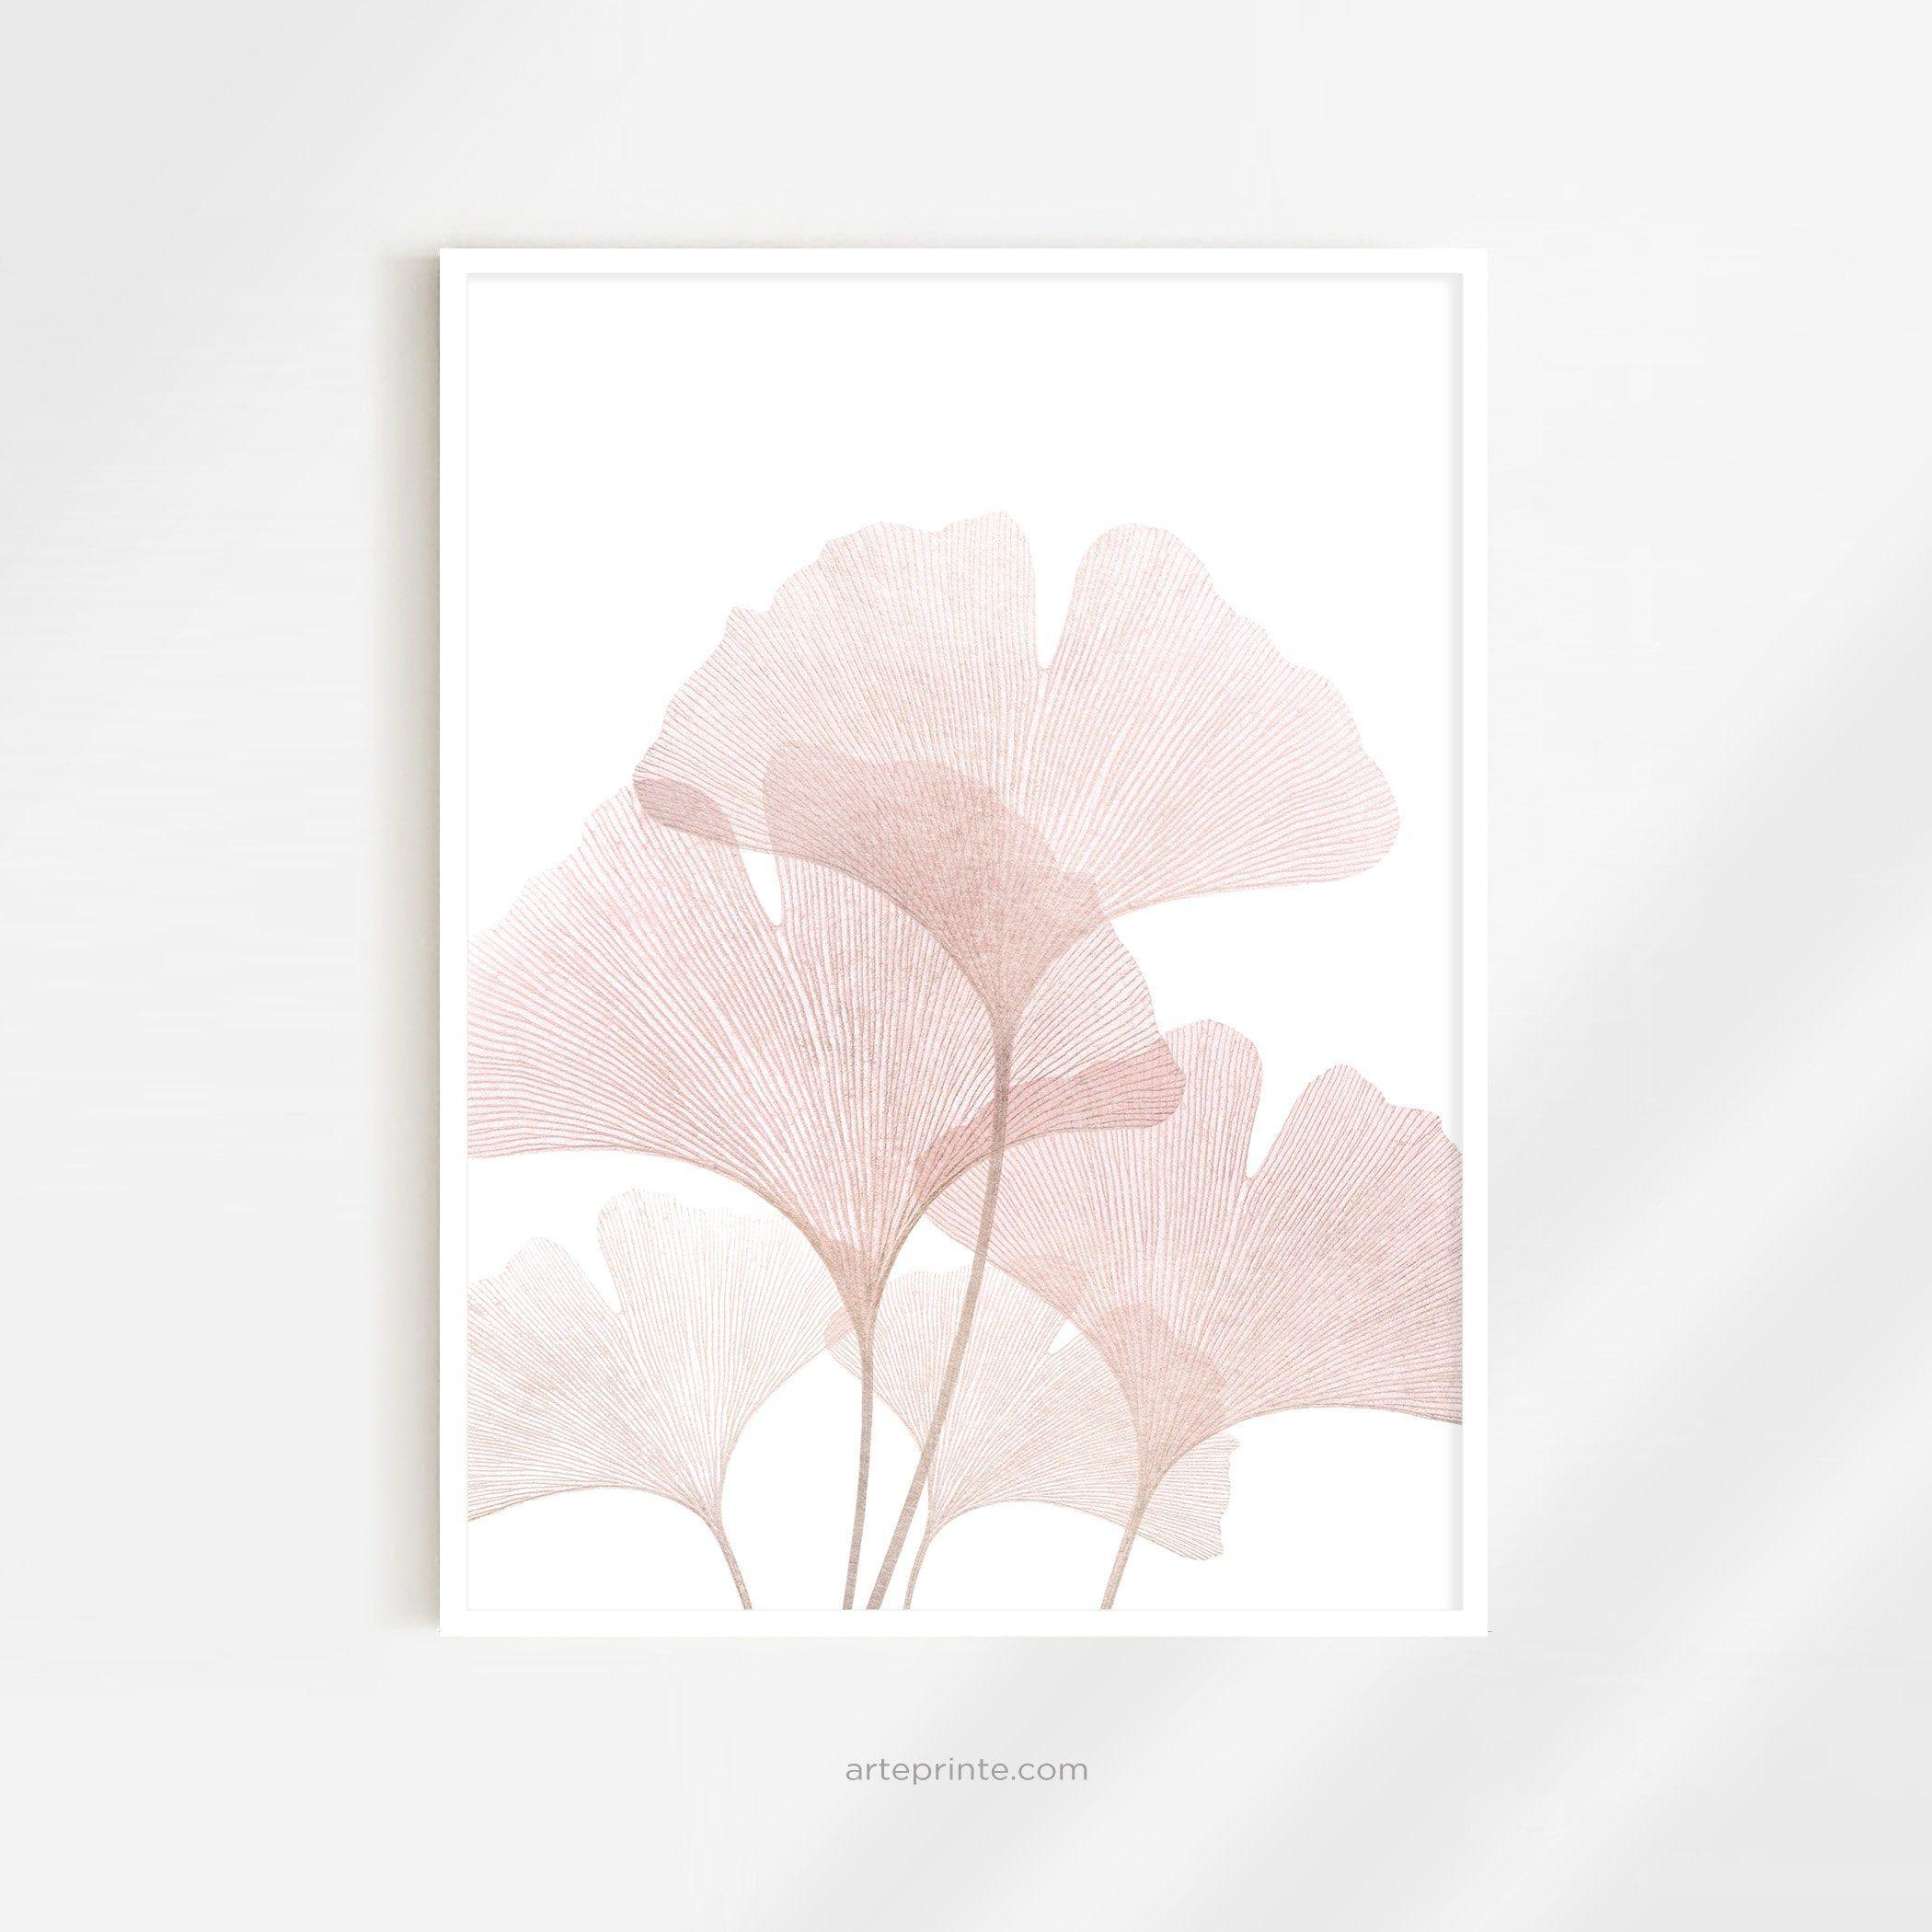 Digital Print Instant Download Modern Boho Decor Fine Art Pastel Poster Minimalist Photography Art Rustic Chic Light Pink Wall Art